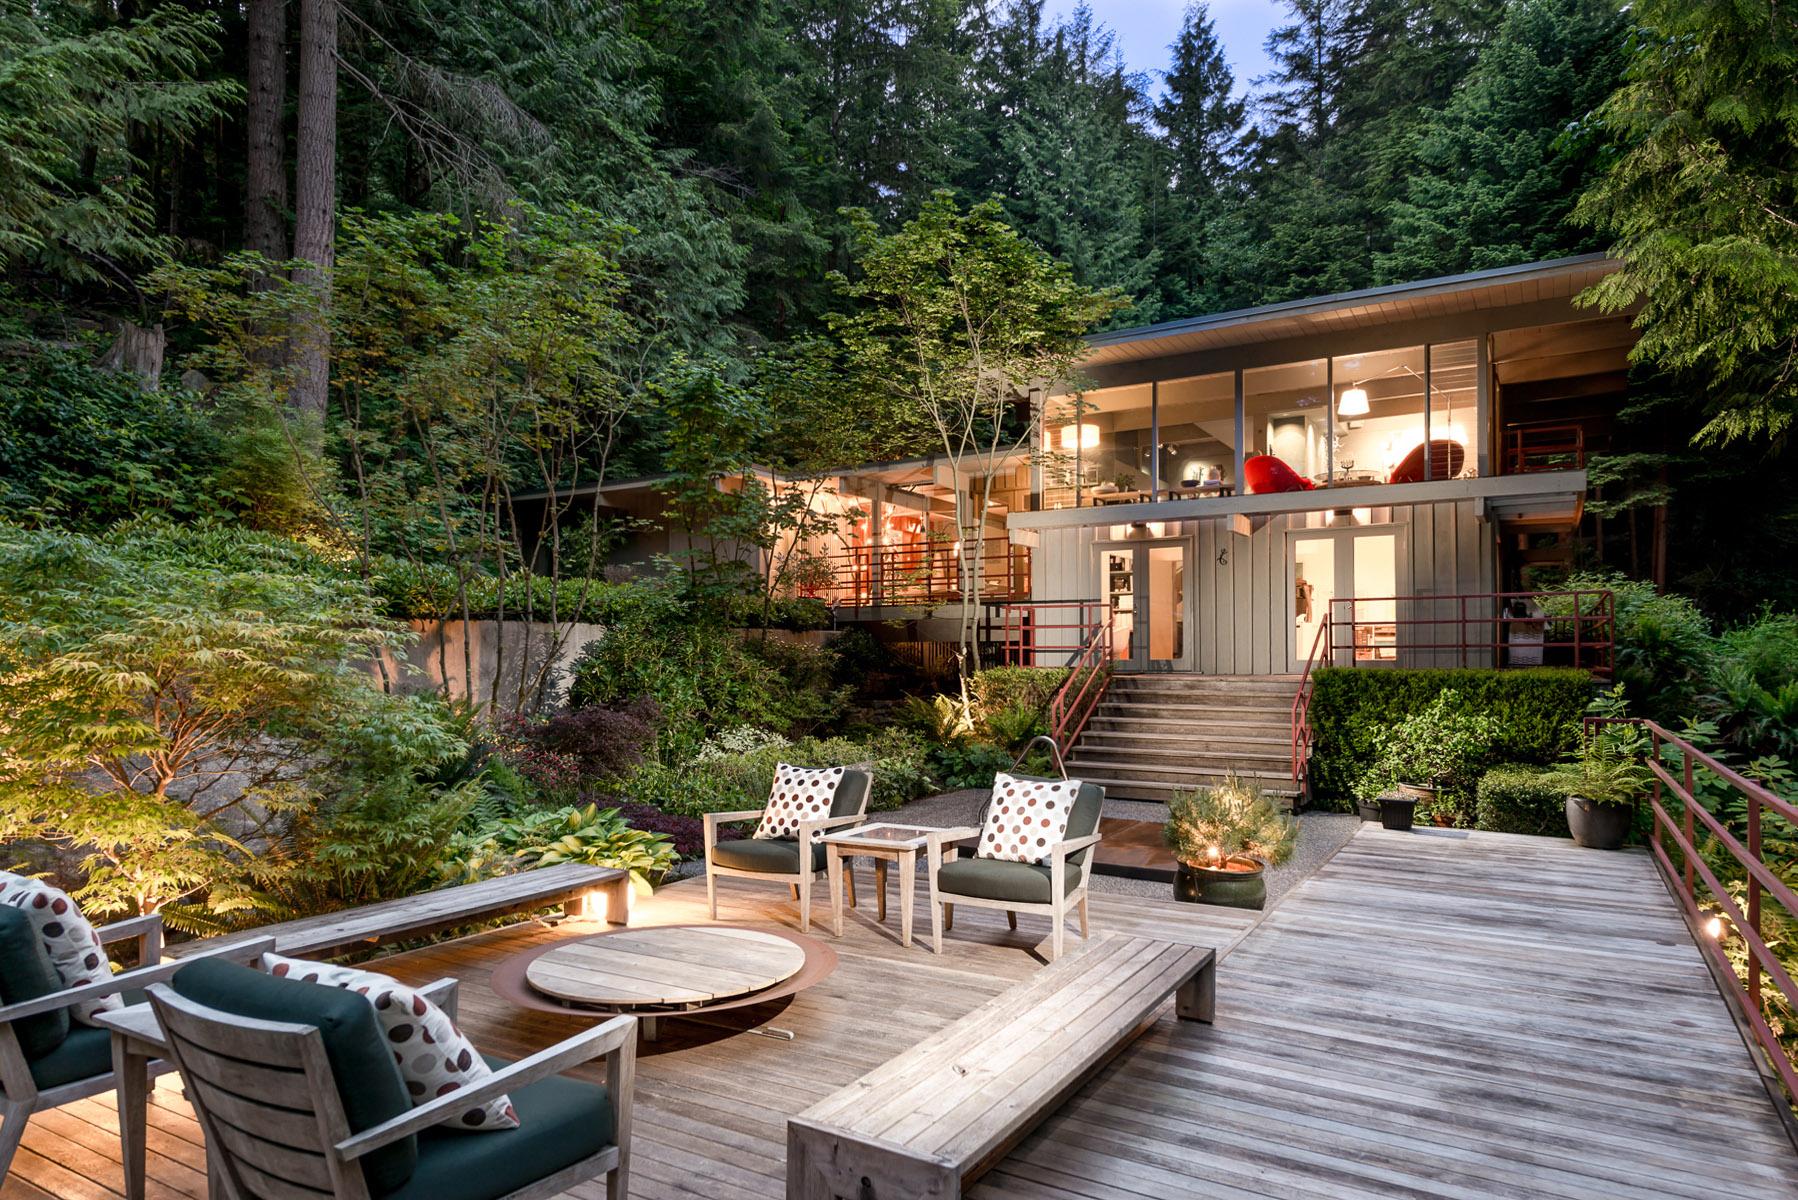 4301-Woodcrest-Road-West-Vancouver-360hometours-01s.jpg